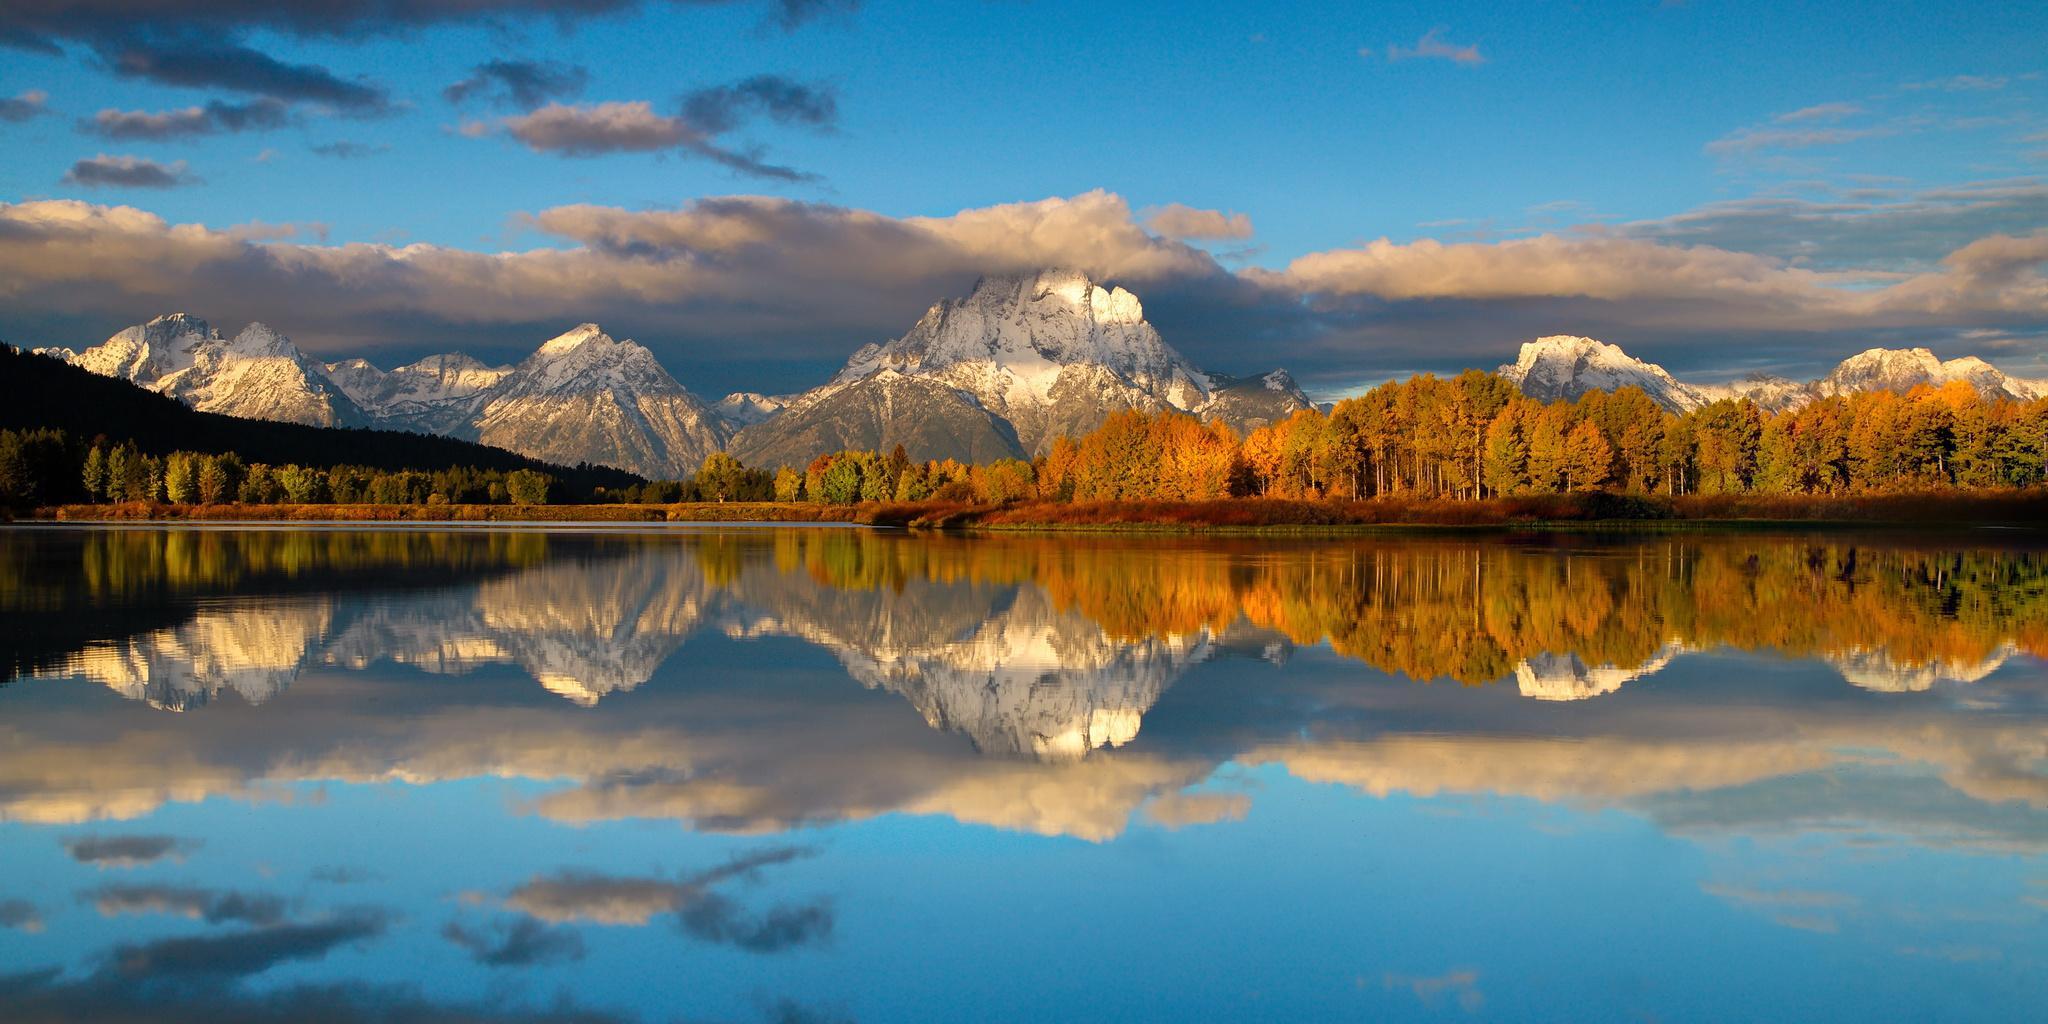 Windows 10 Fall Usa Wallpapers 4k Grand Teton National Park United States Wyoming